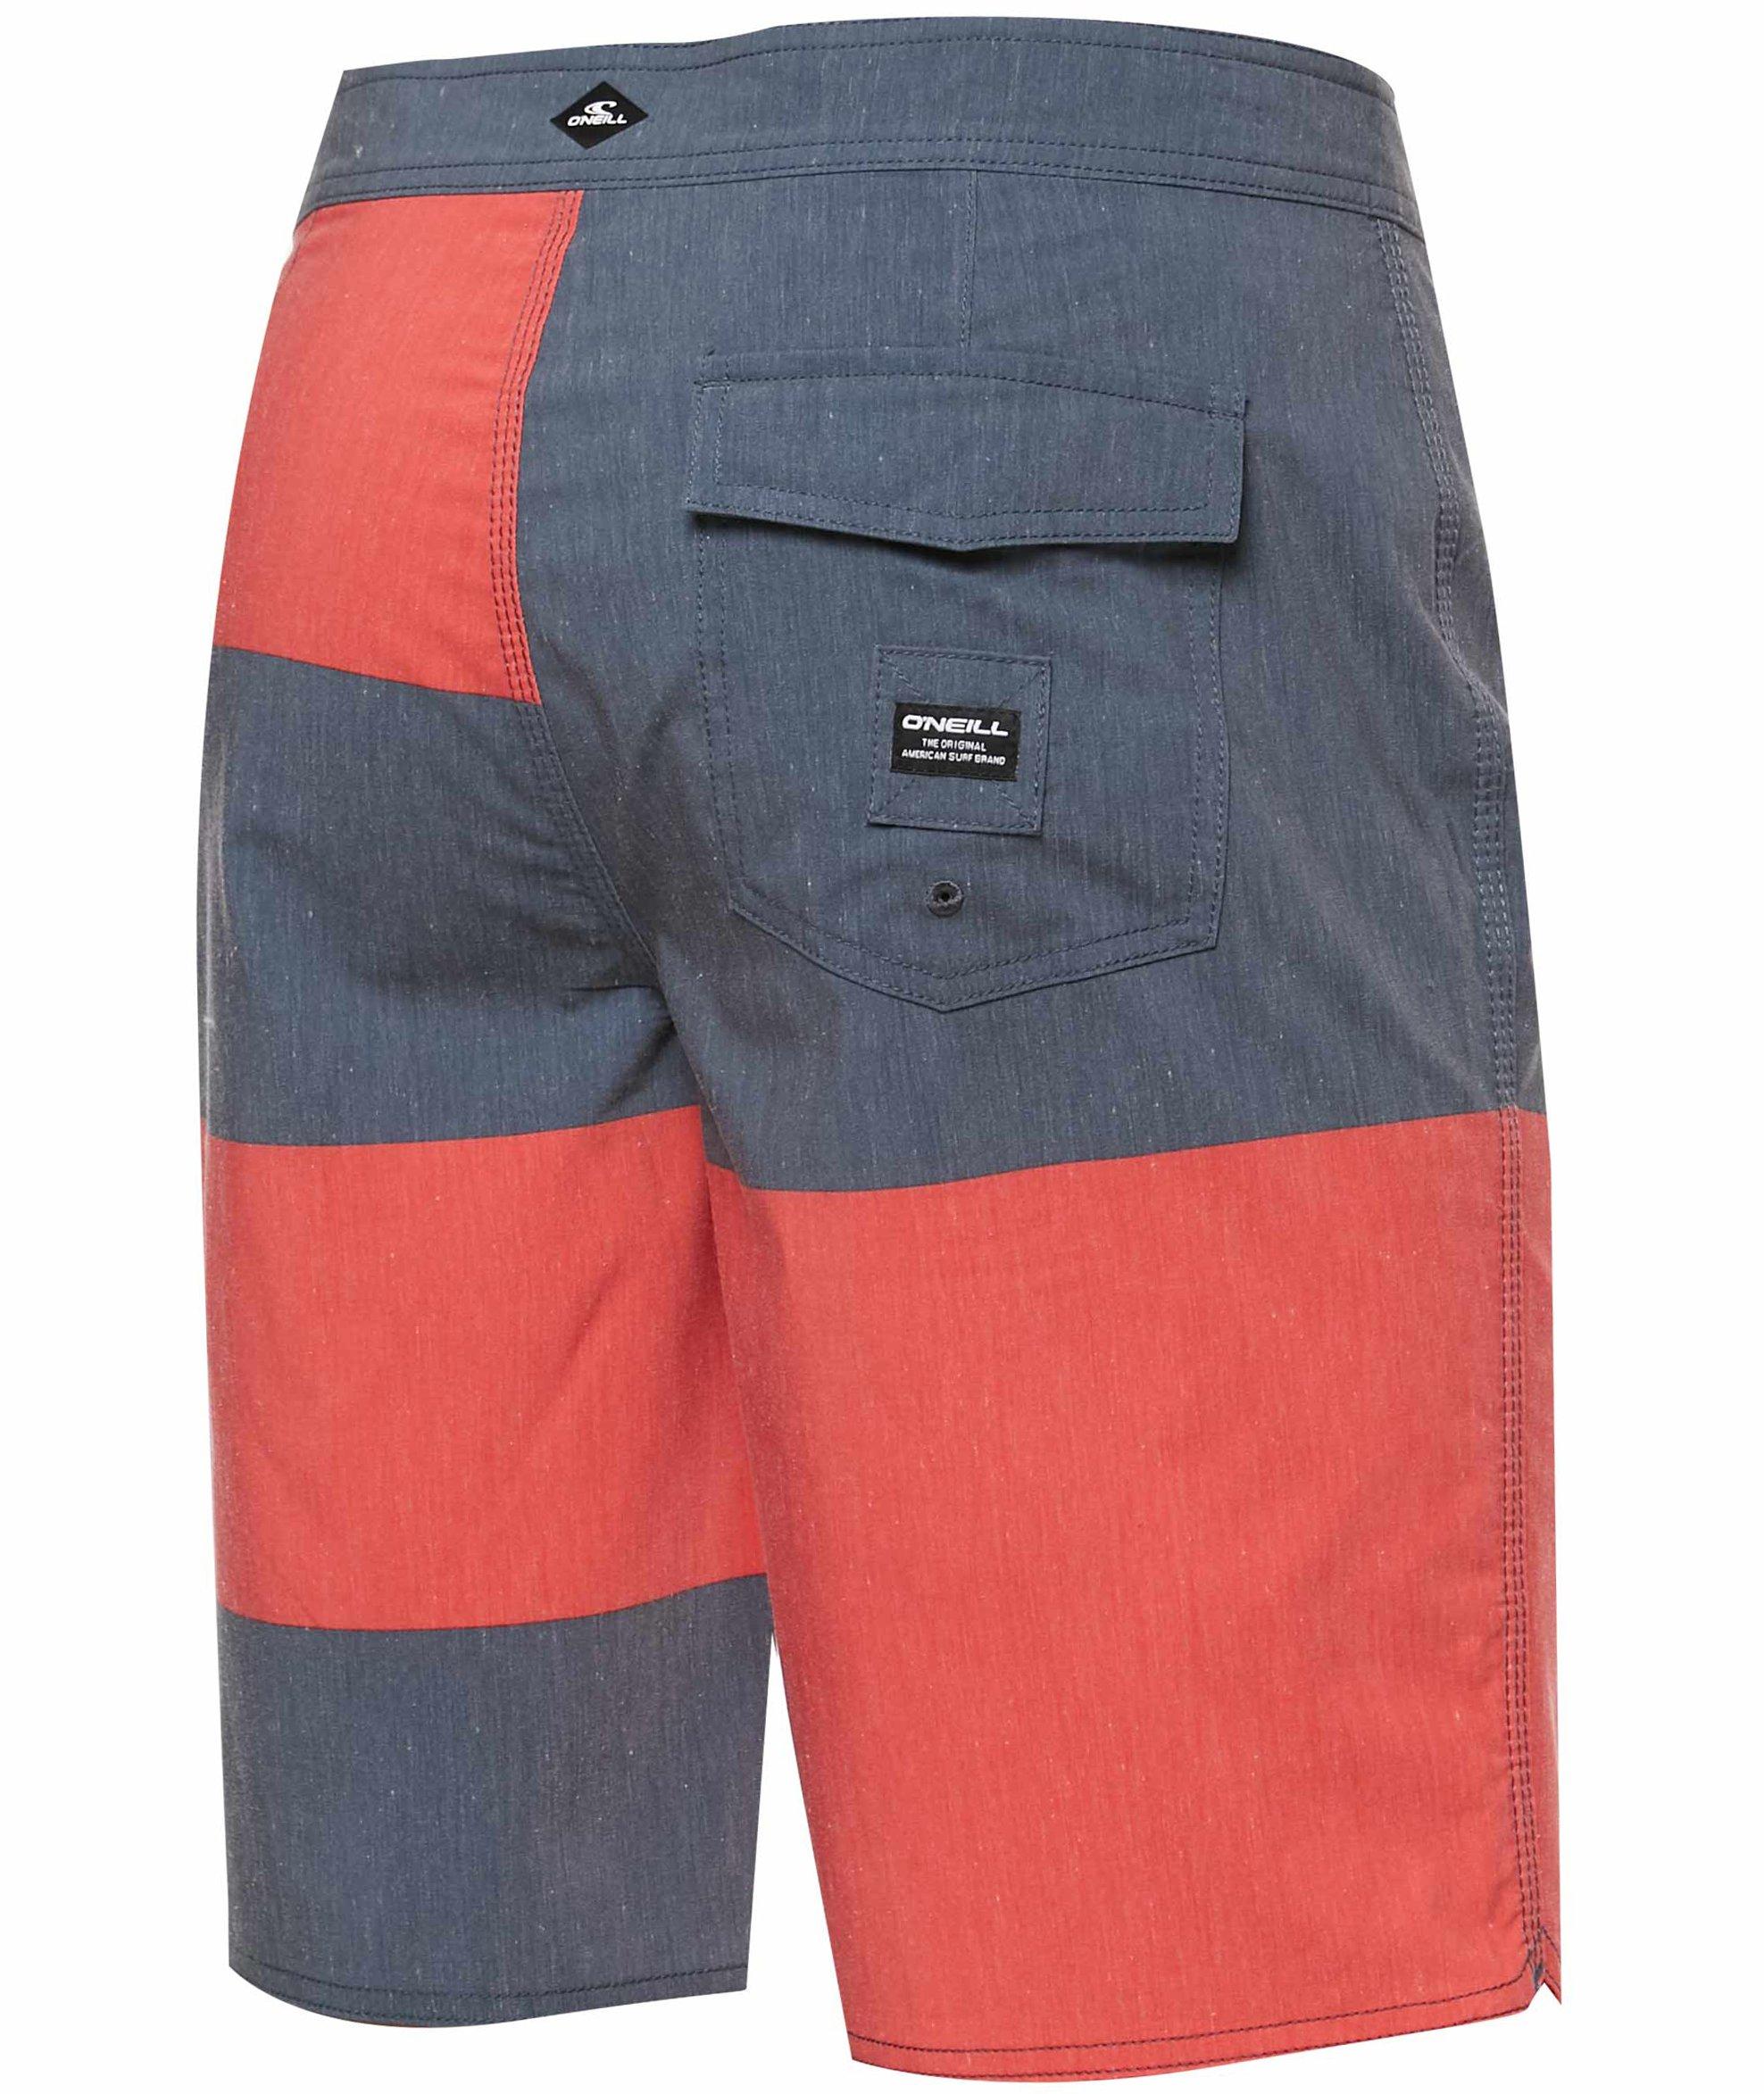 O'Neill Men's Hyperfreak Heist Informant Boardshort - Informant Red, Size 34 by O'Neill (Image #2)